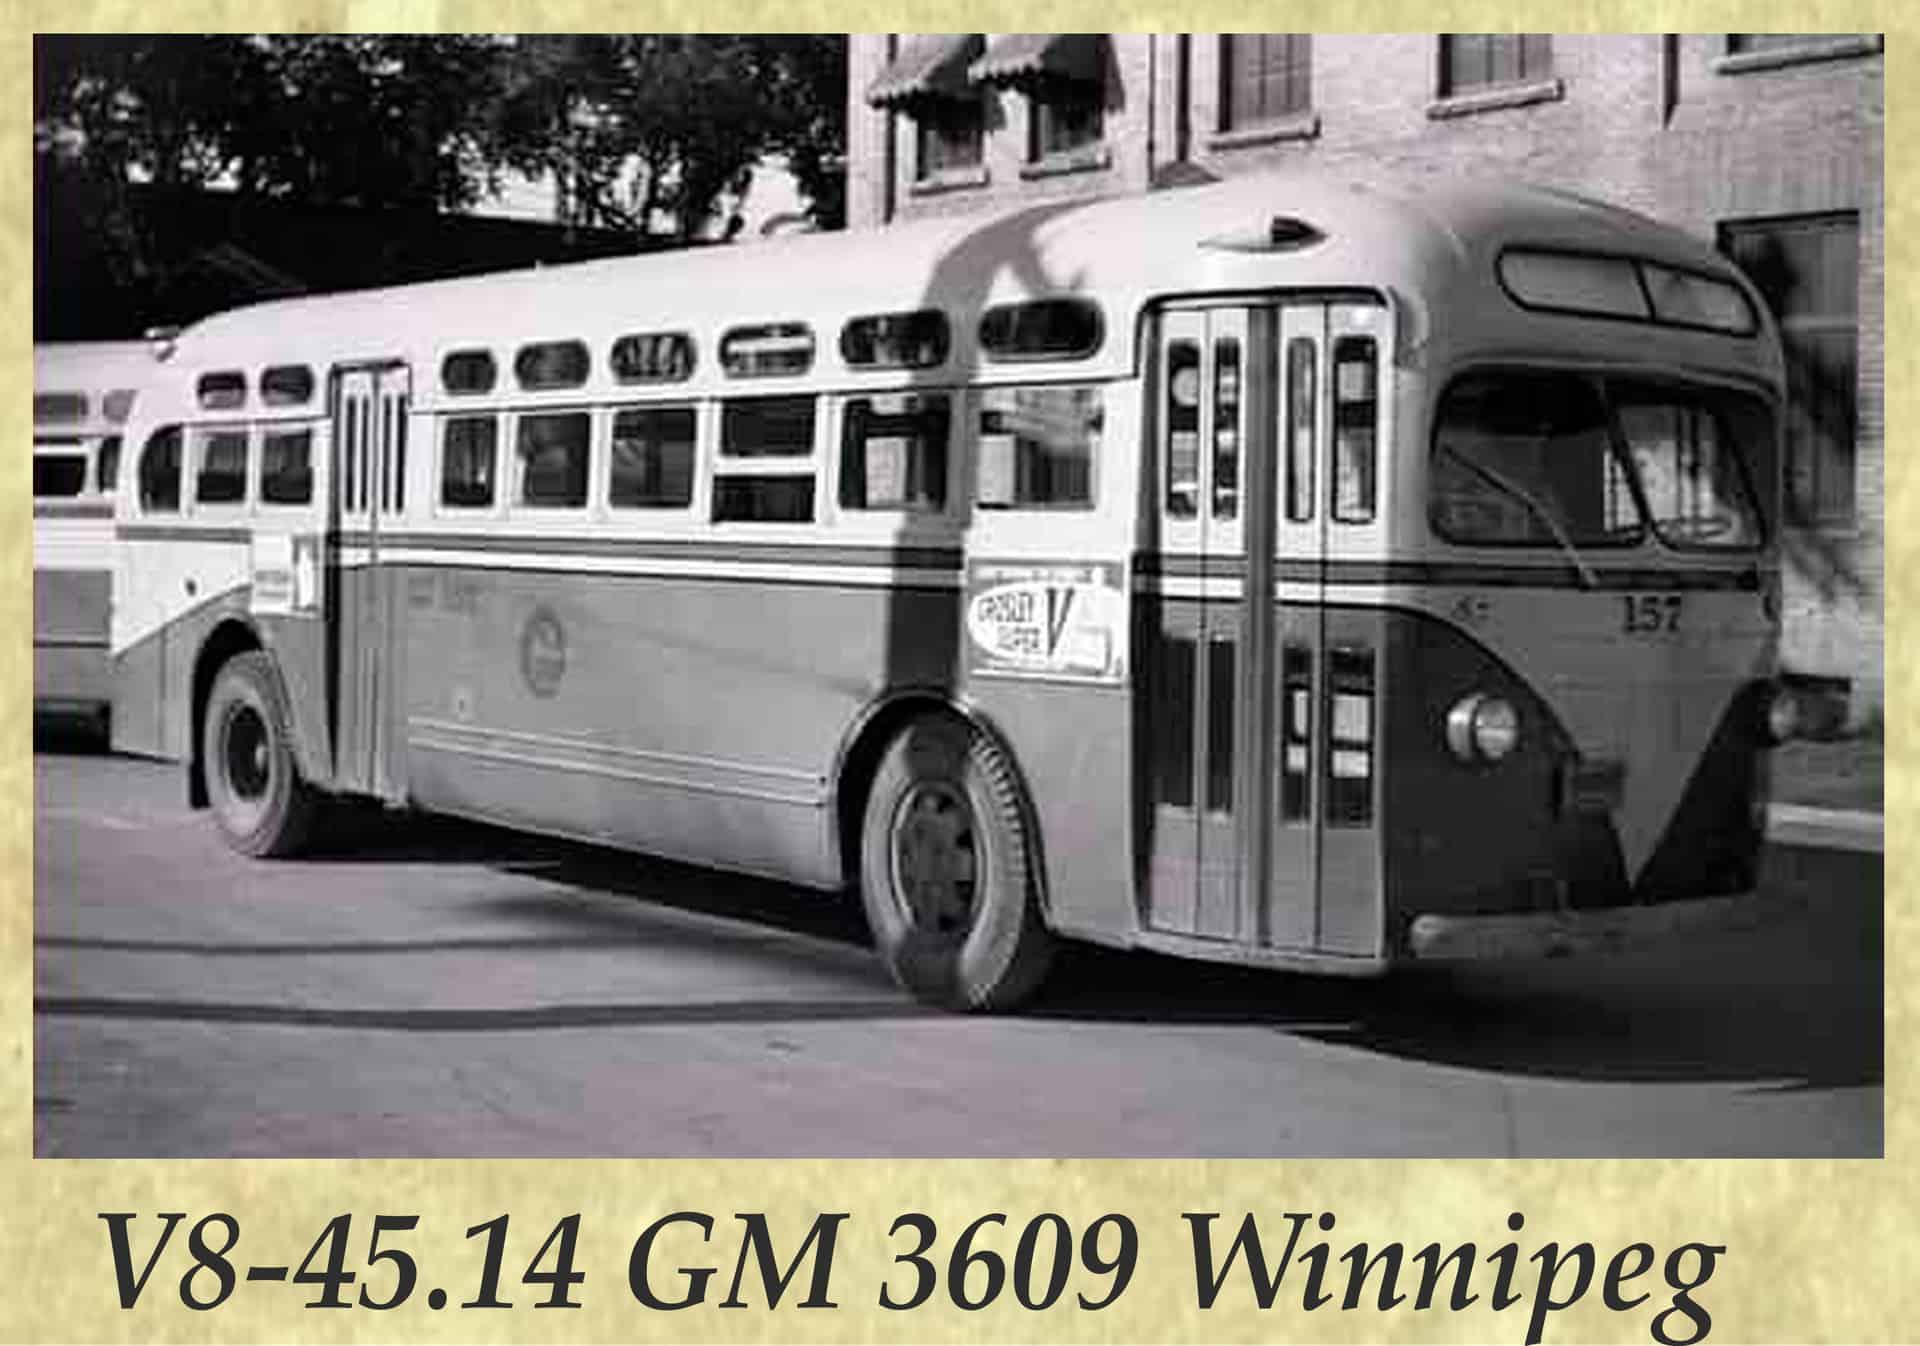 V8-45.14 GM 3609 Winnipeg